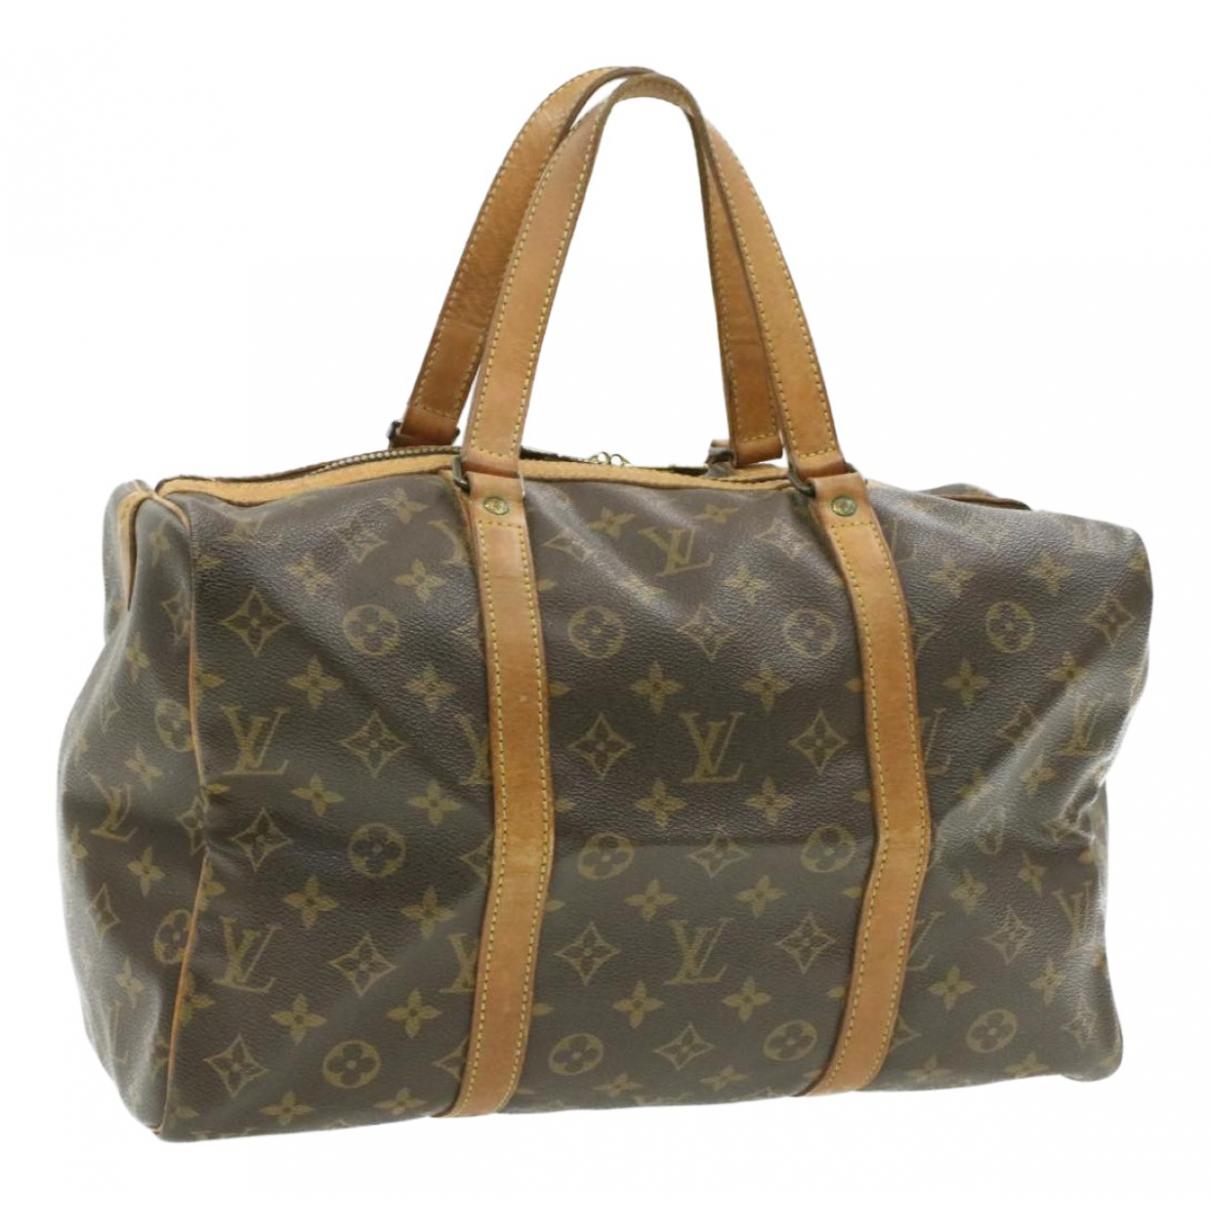 Bolso de viaje Sac souple  de Lona Louis Vuitton